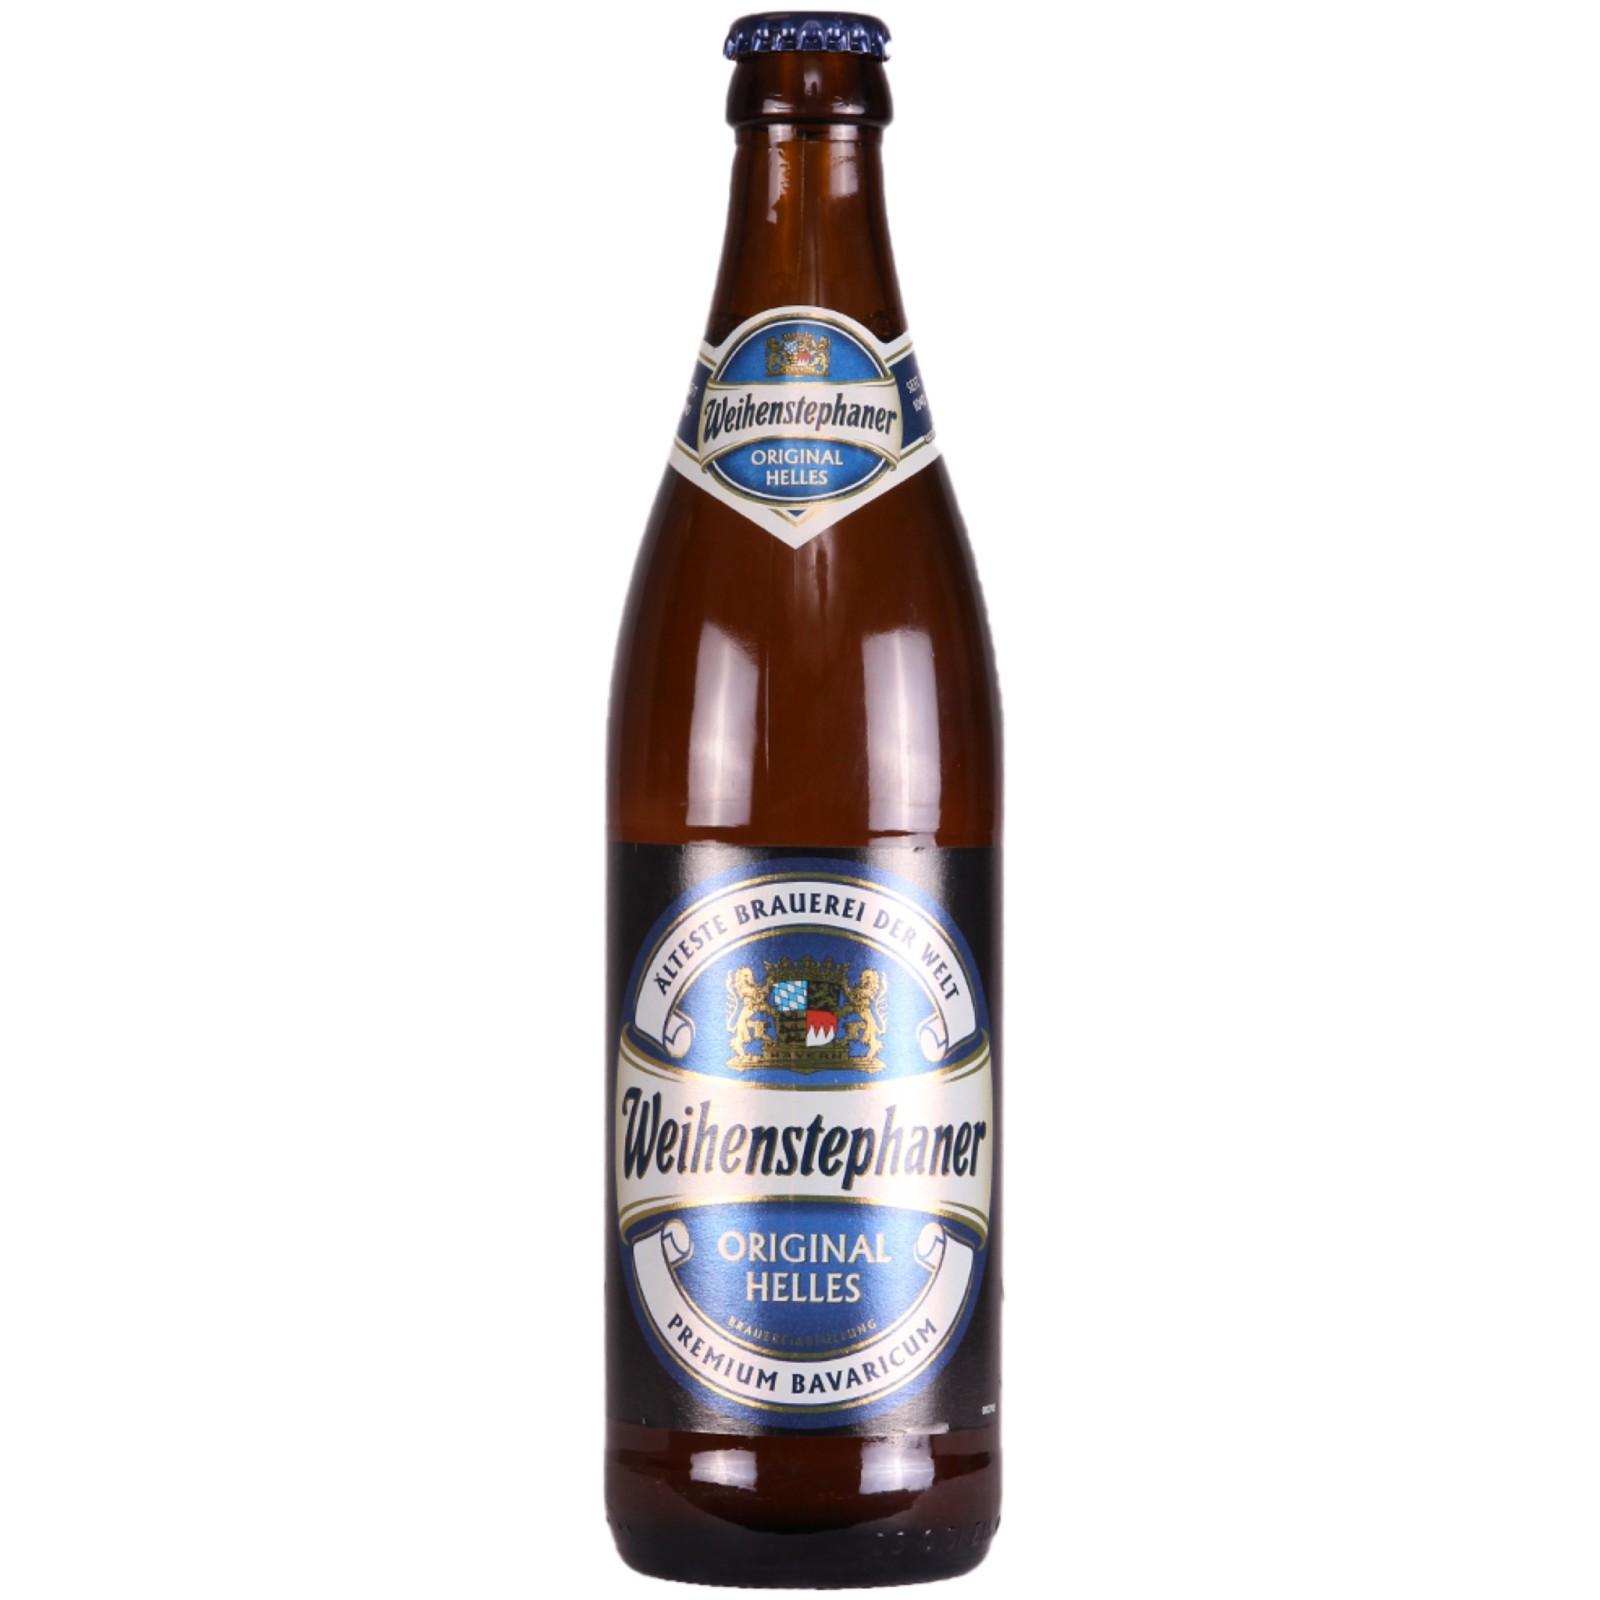 Weihenstephaner Original Helles 5.1% 500ml